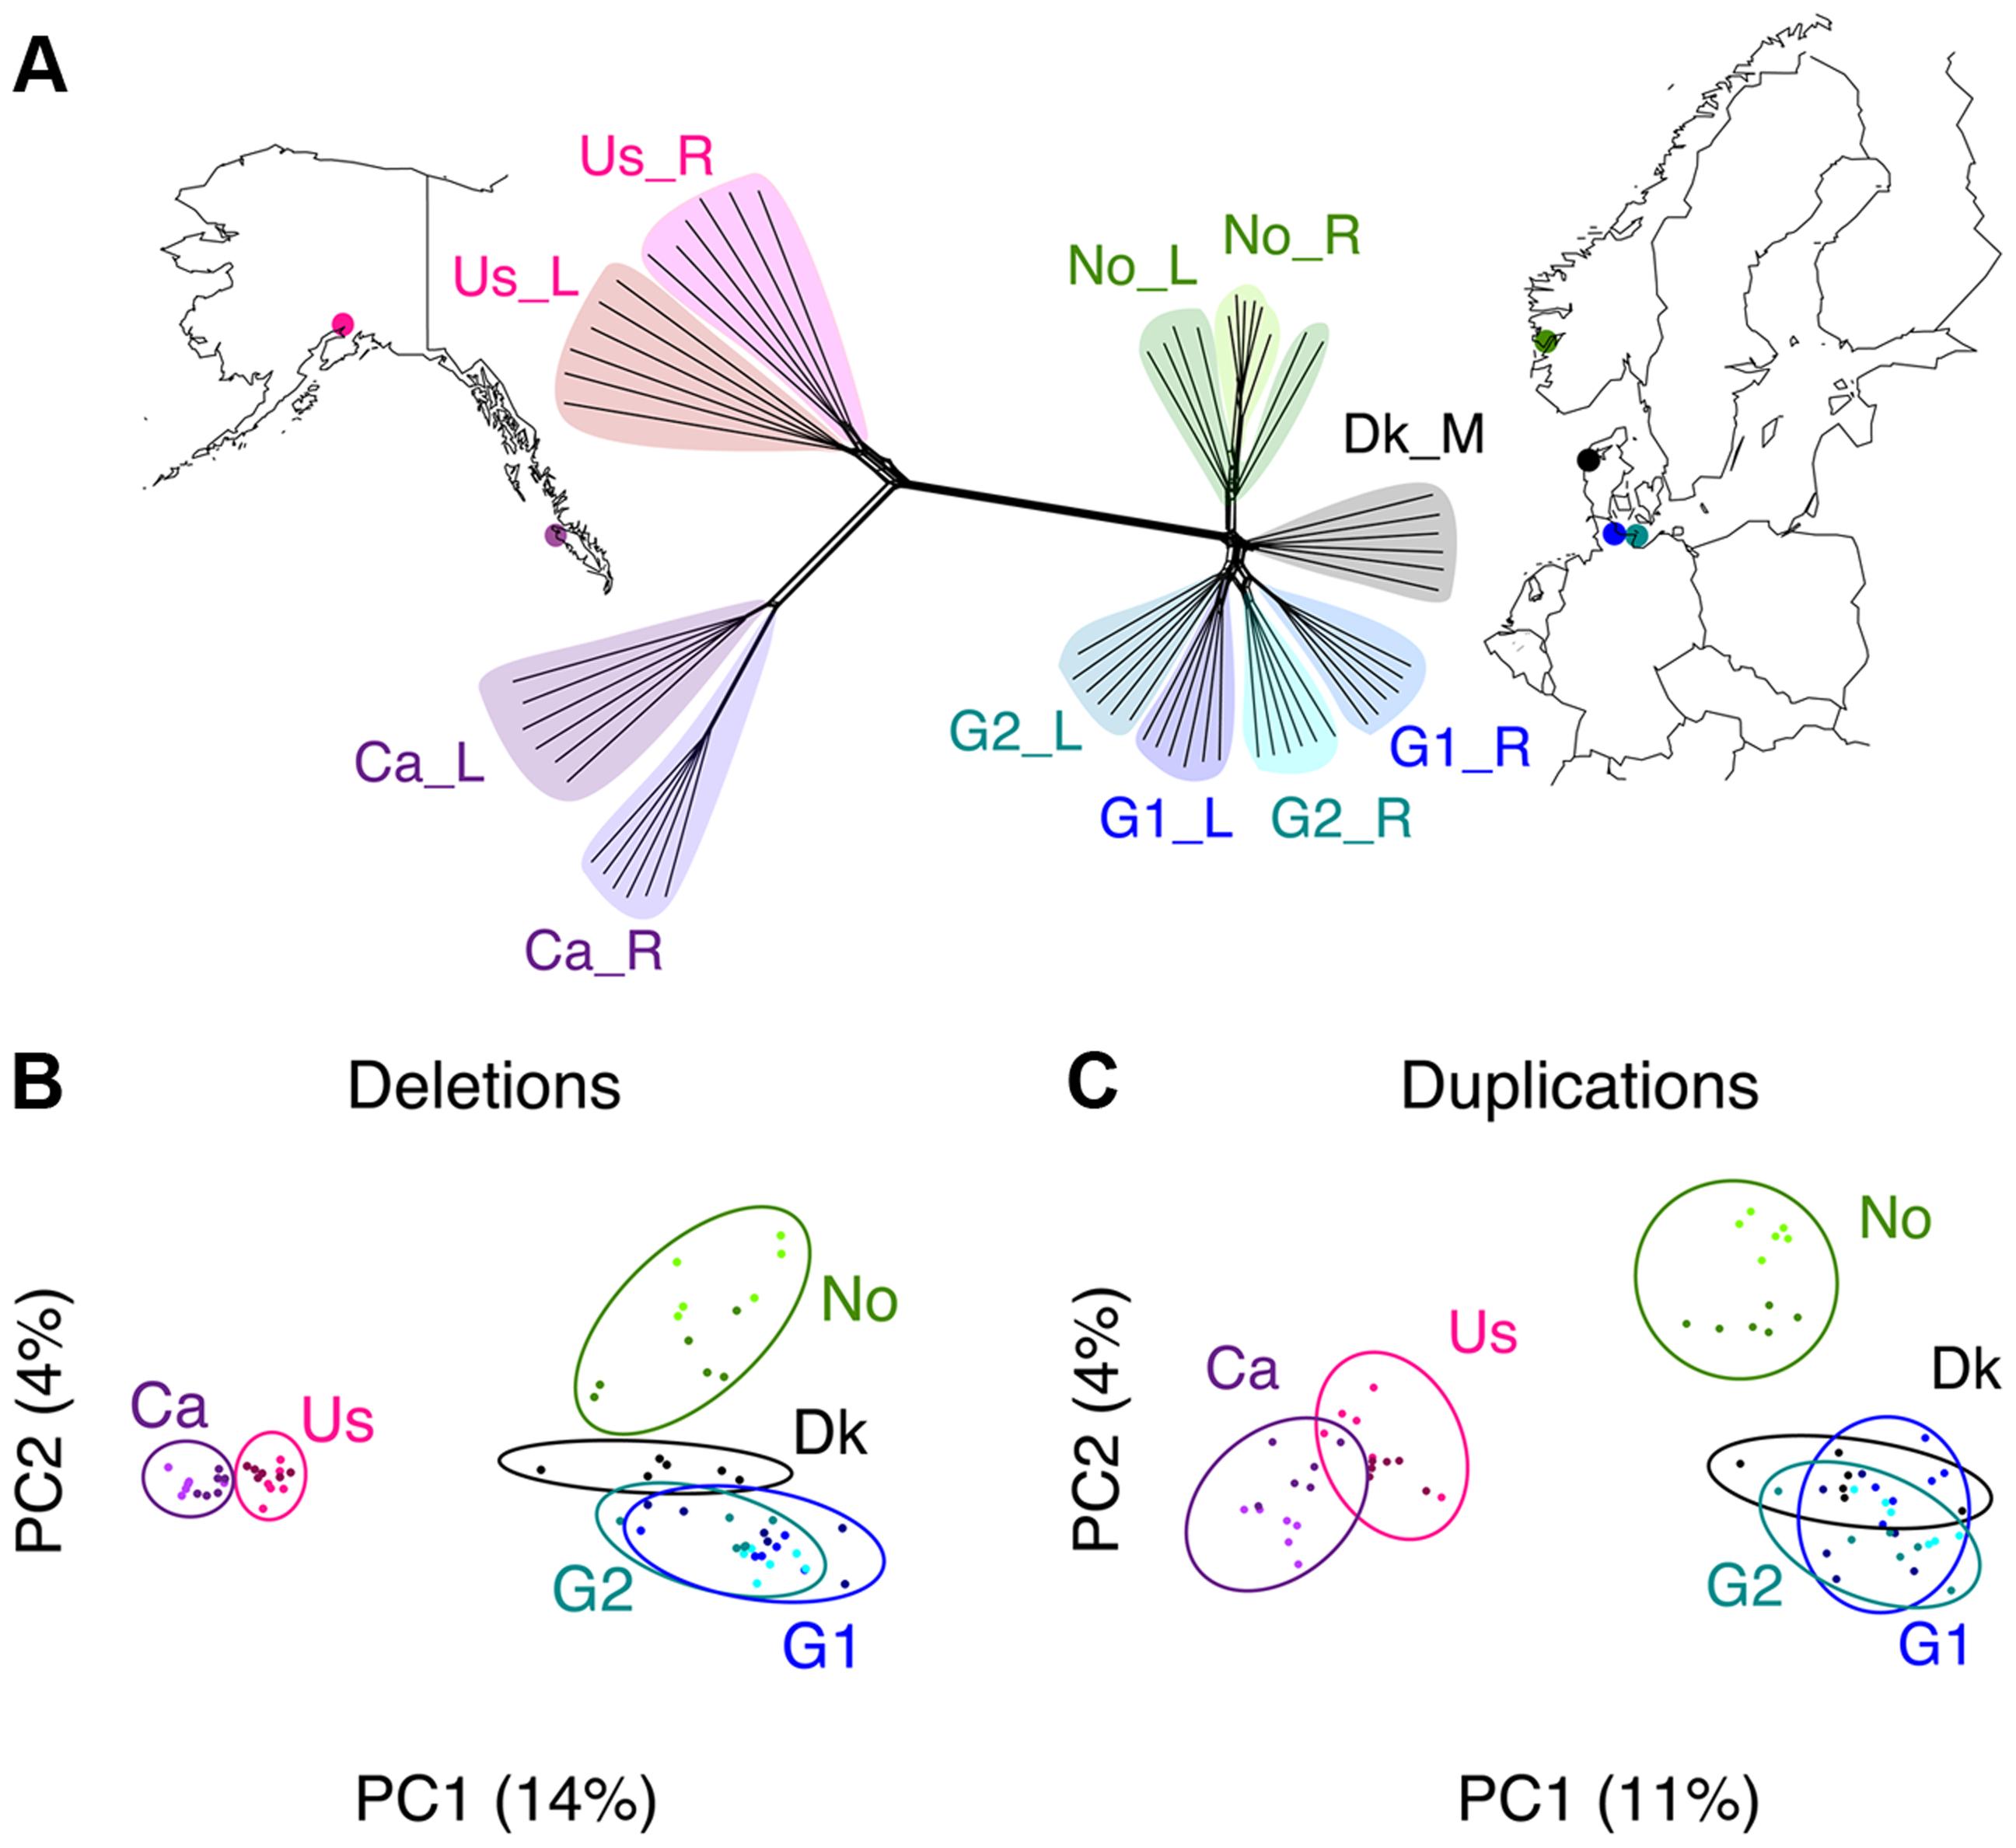 Phylogenomic relationships among samples.